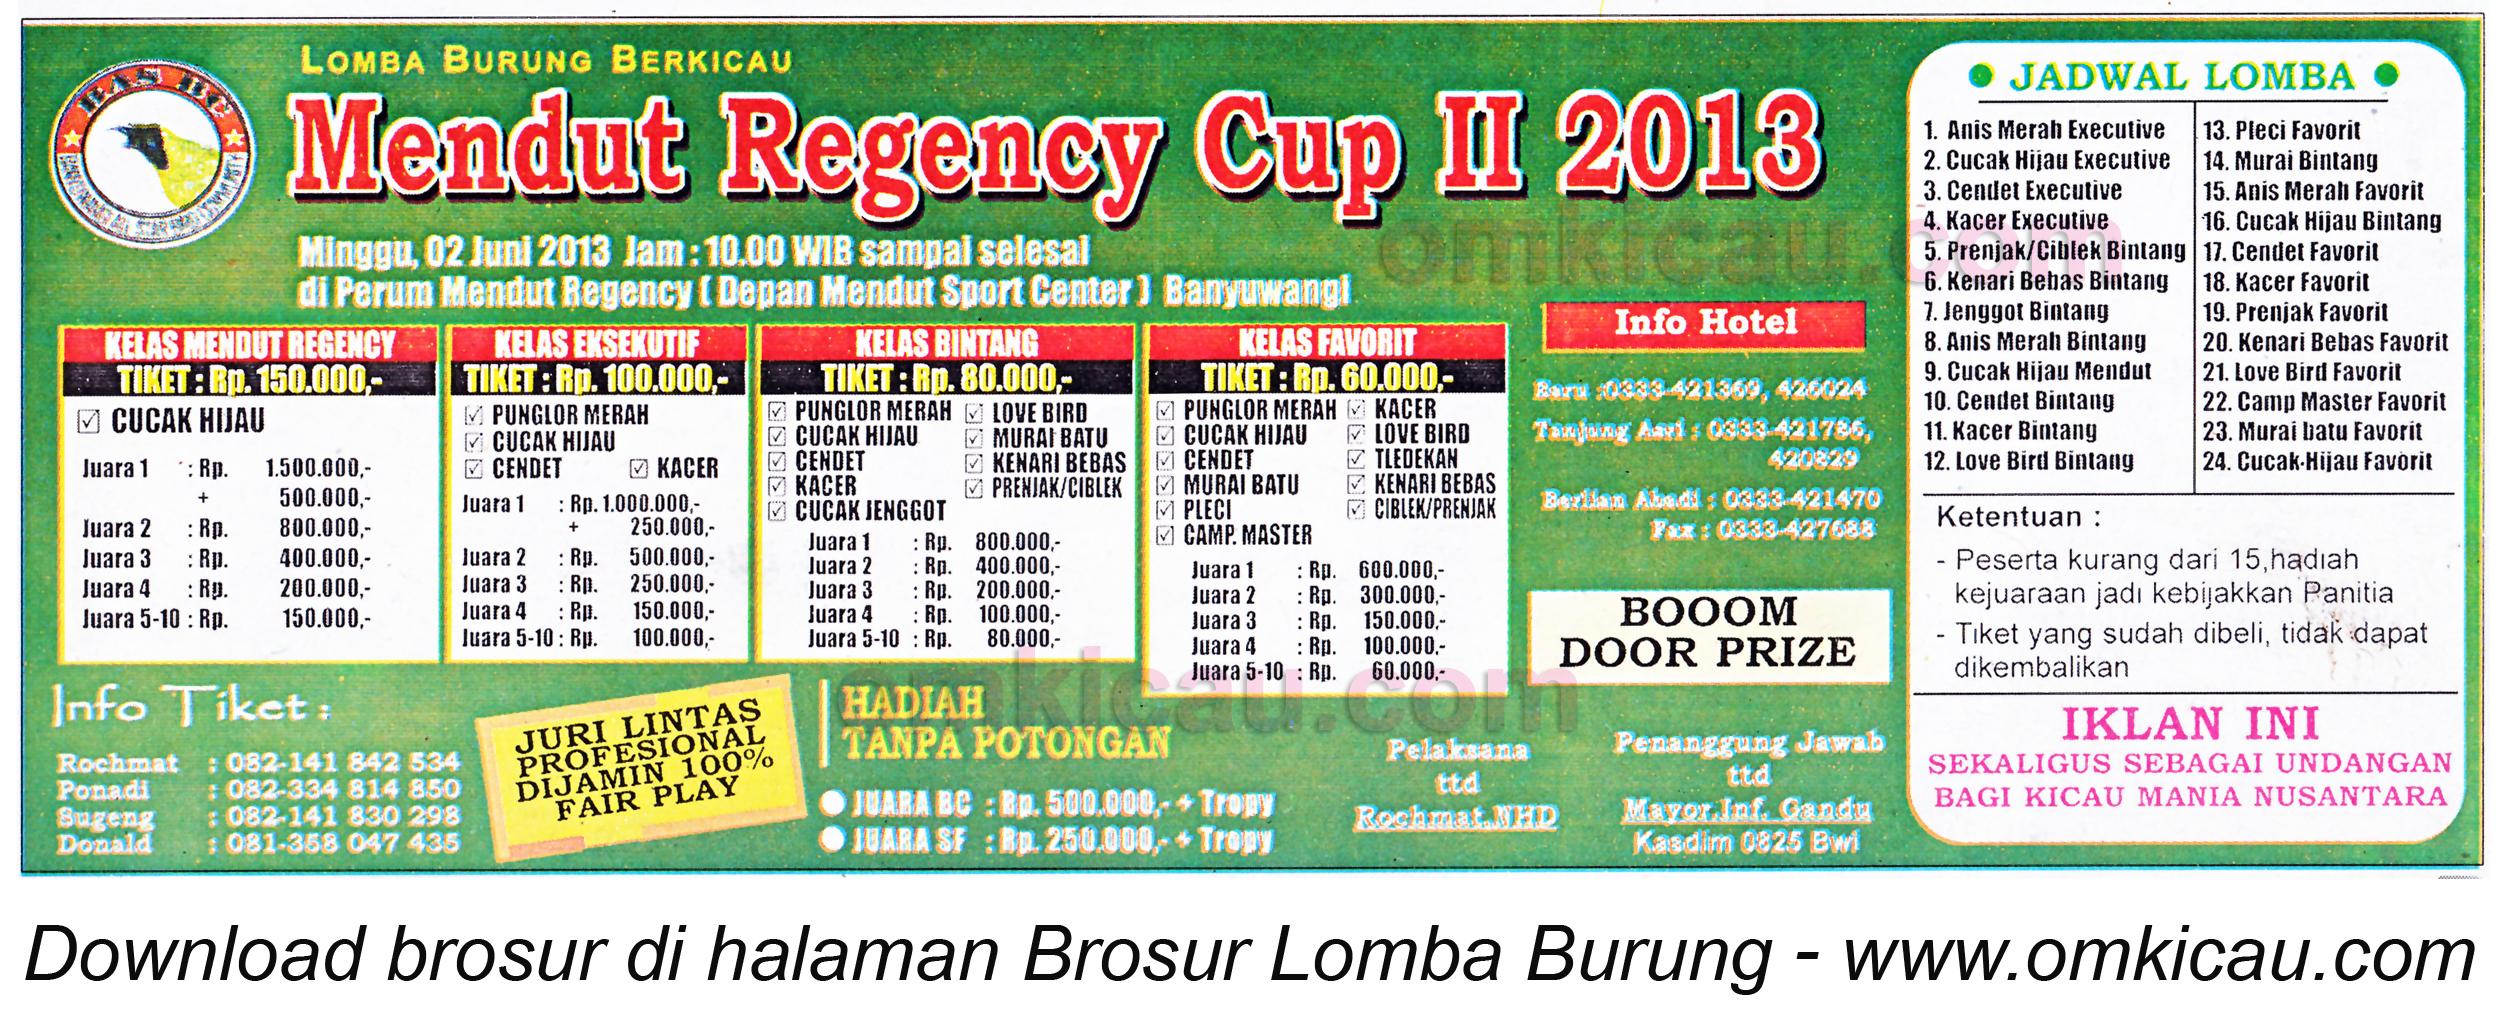 Brosur Lomba Burung Mendut Regency Cup II 2 Juni 2013